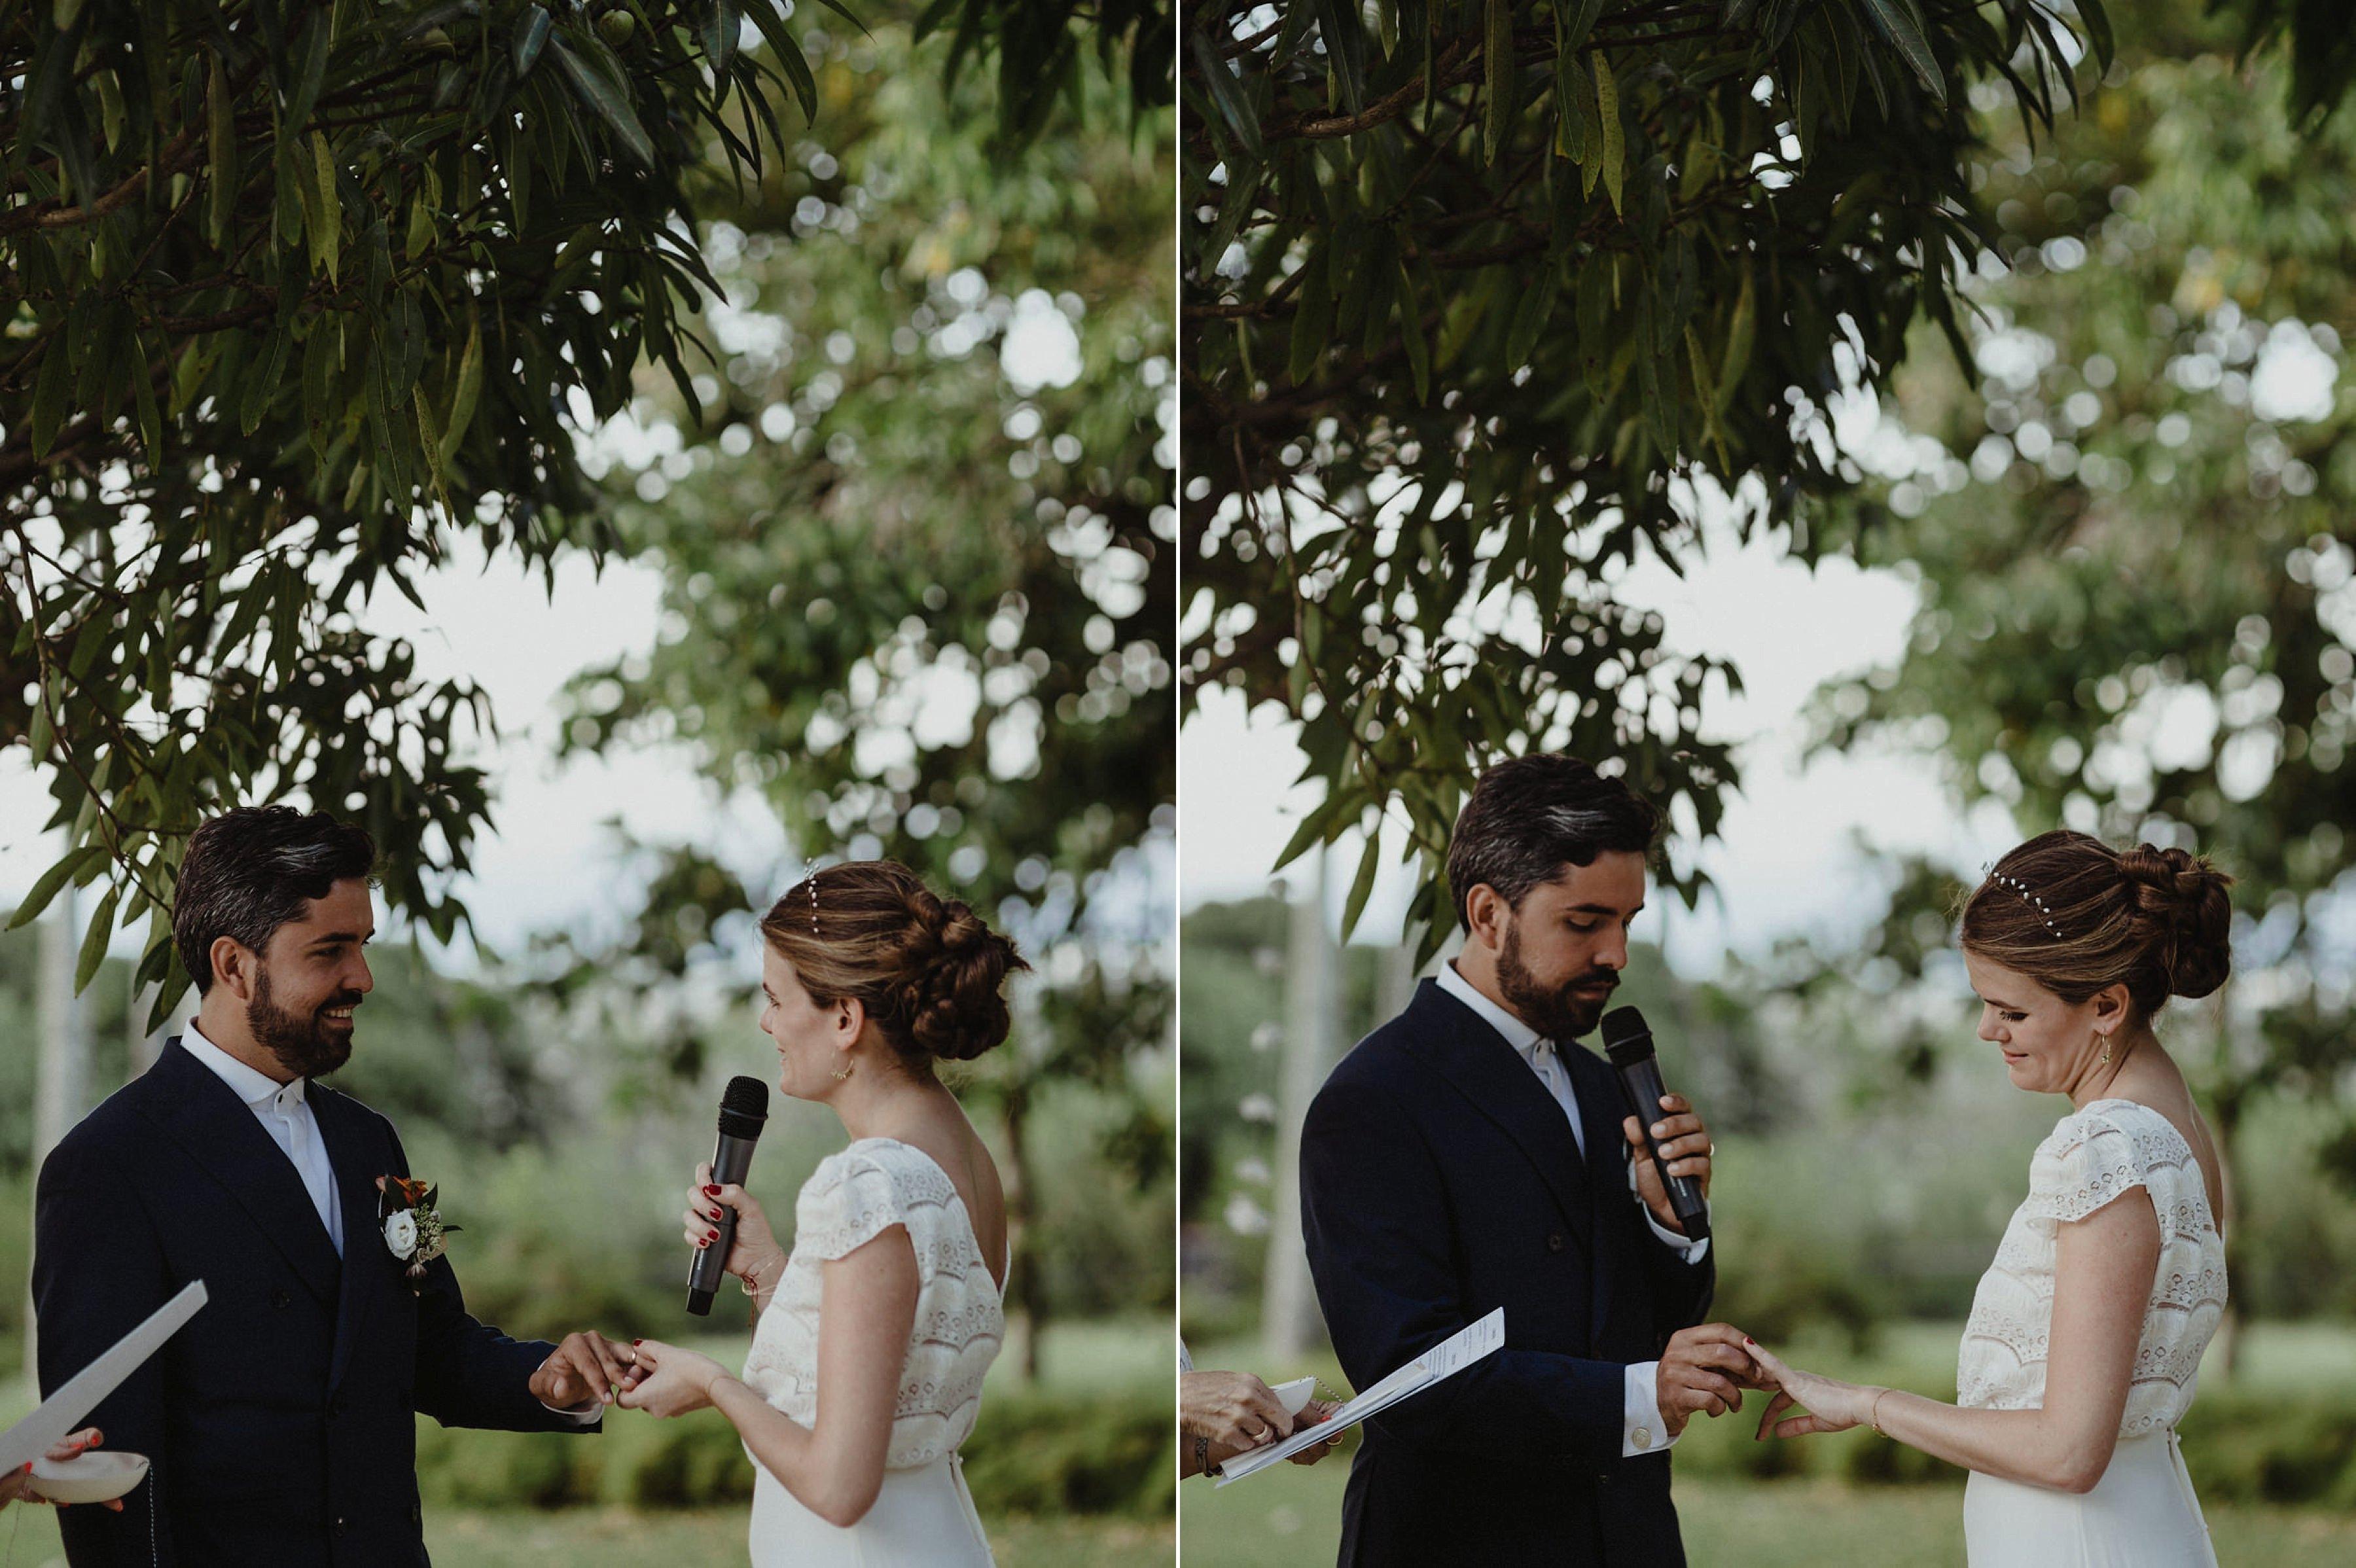 capyture-wedding-photographer-destination-nature_0822